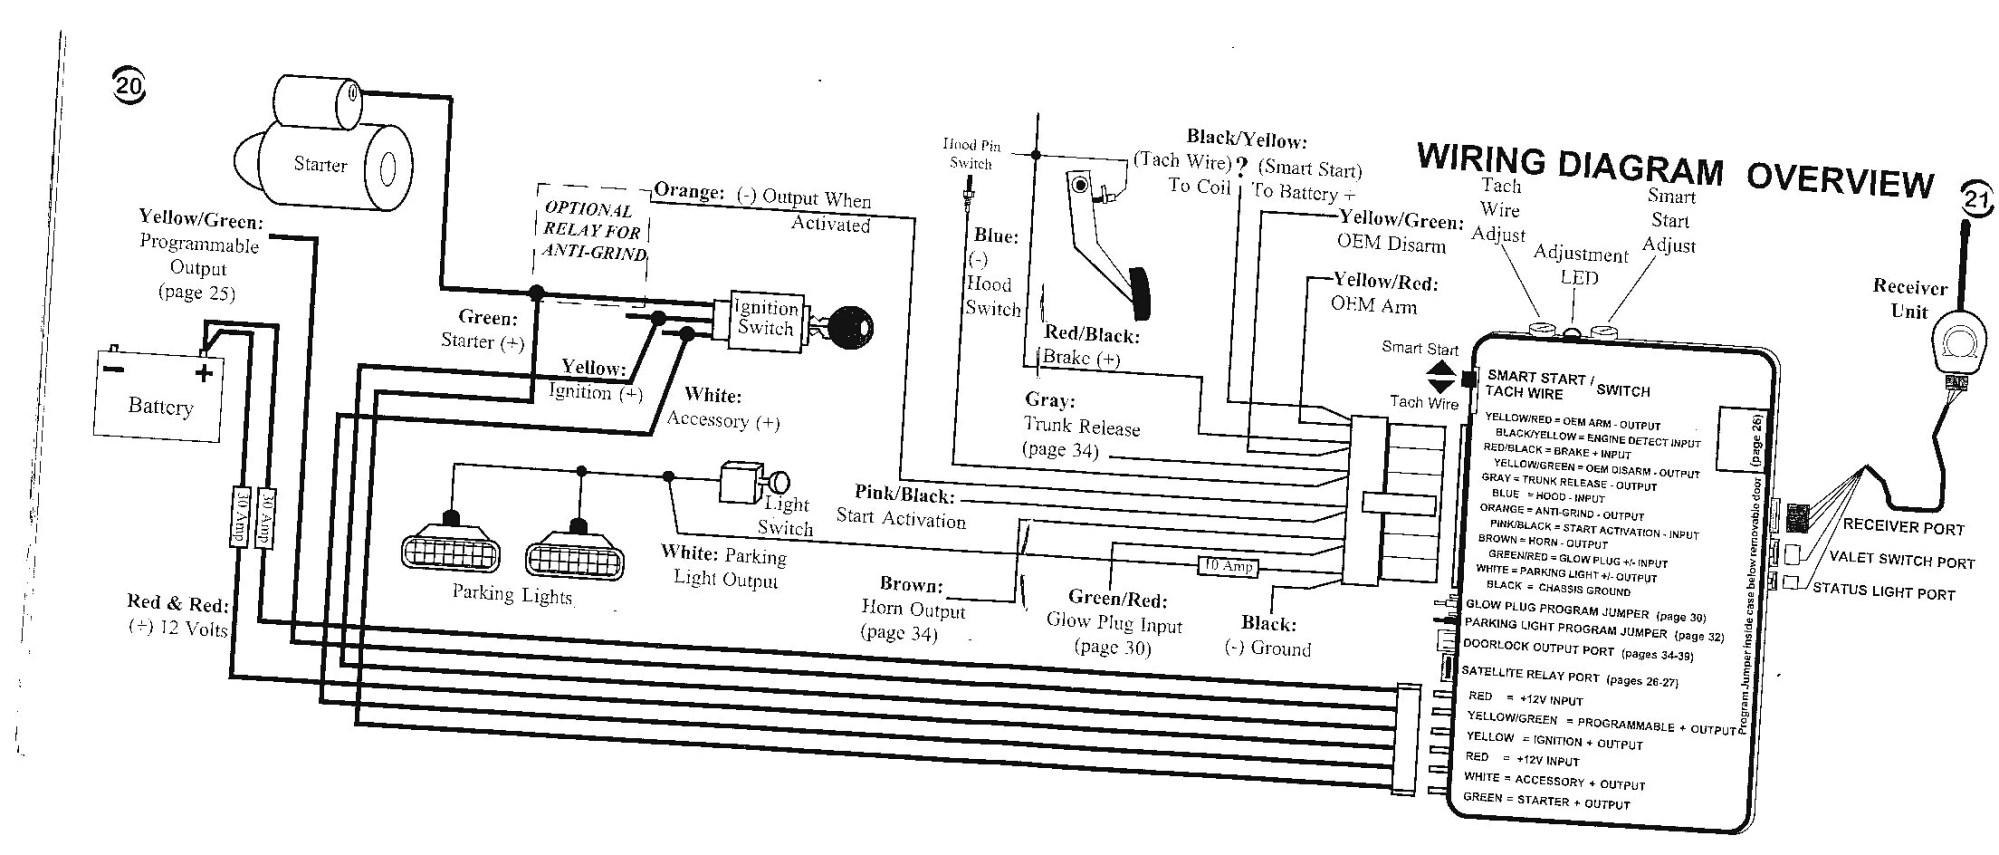 hight resolution of viper car alarm wiring diagram viper 771xv wiring diagram tech support forum brilliant car alarm of